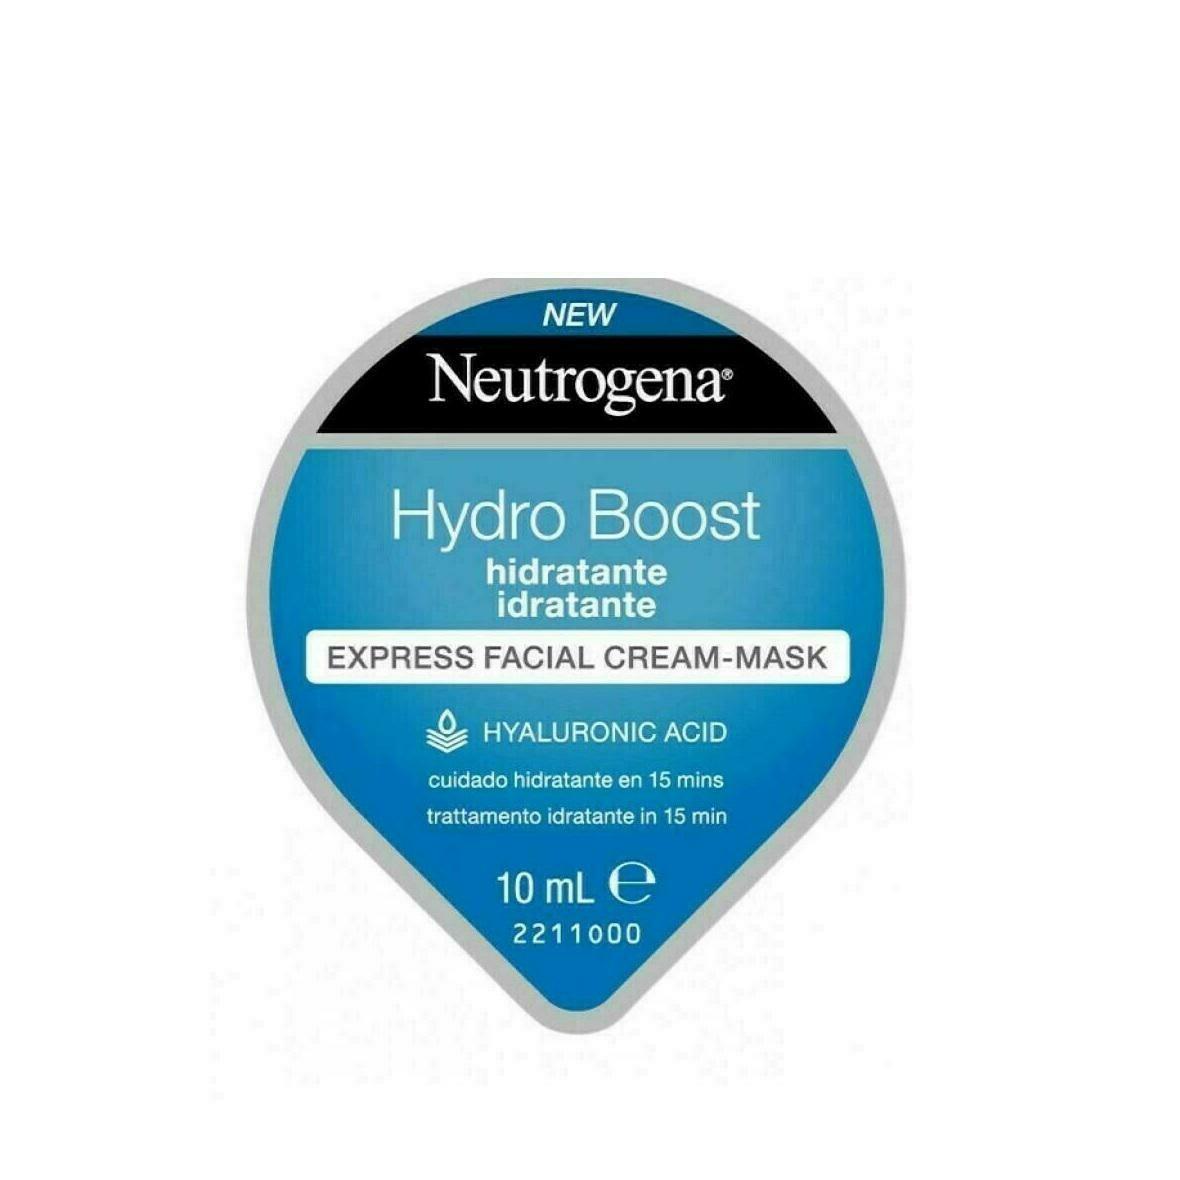 NEUTROGENA HYDRO BOOST EXPRESS FACIAL CREAM-MASK 10 ML